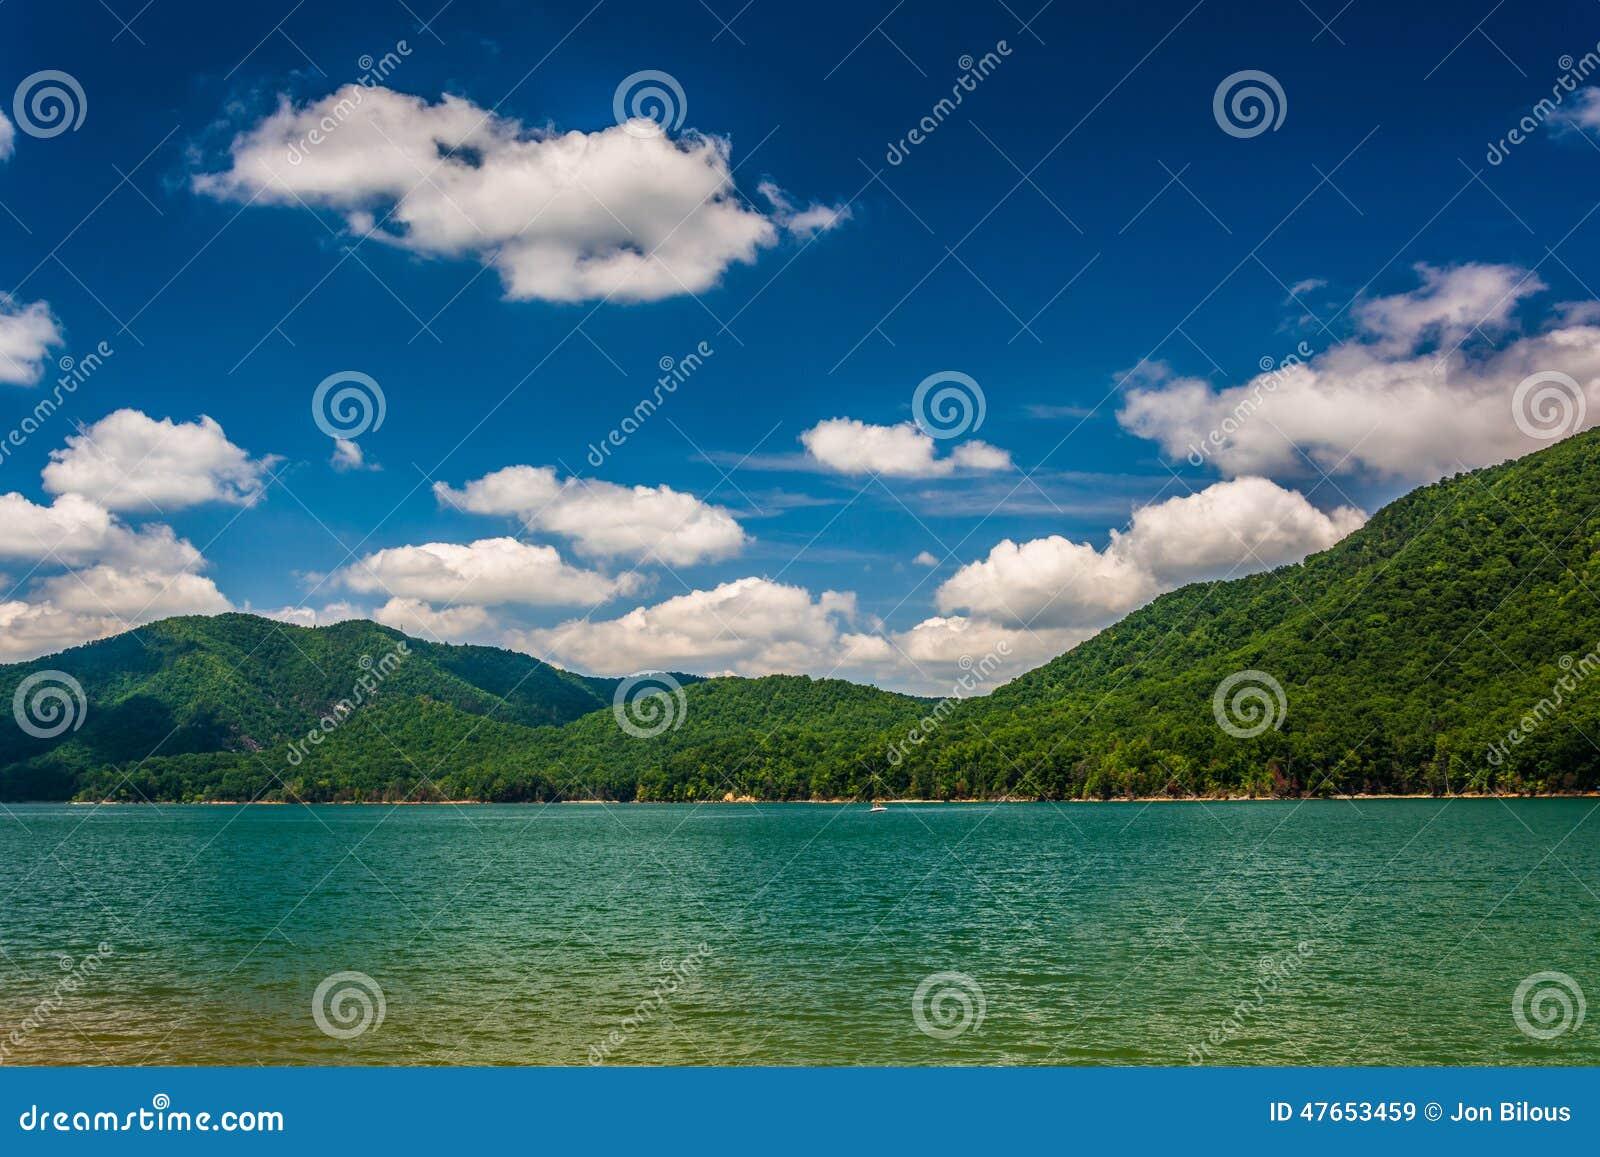 Montanhas ao longo da costa do lago Watauga, no nacional Cherokee